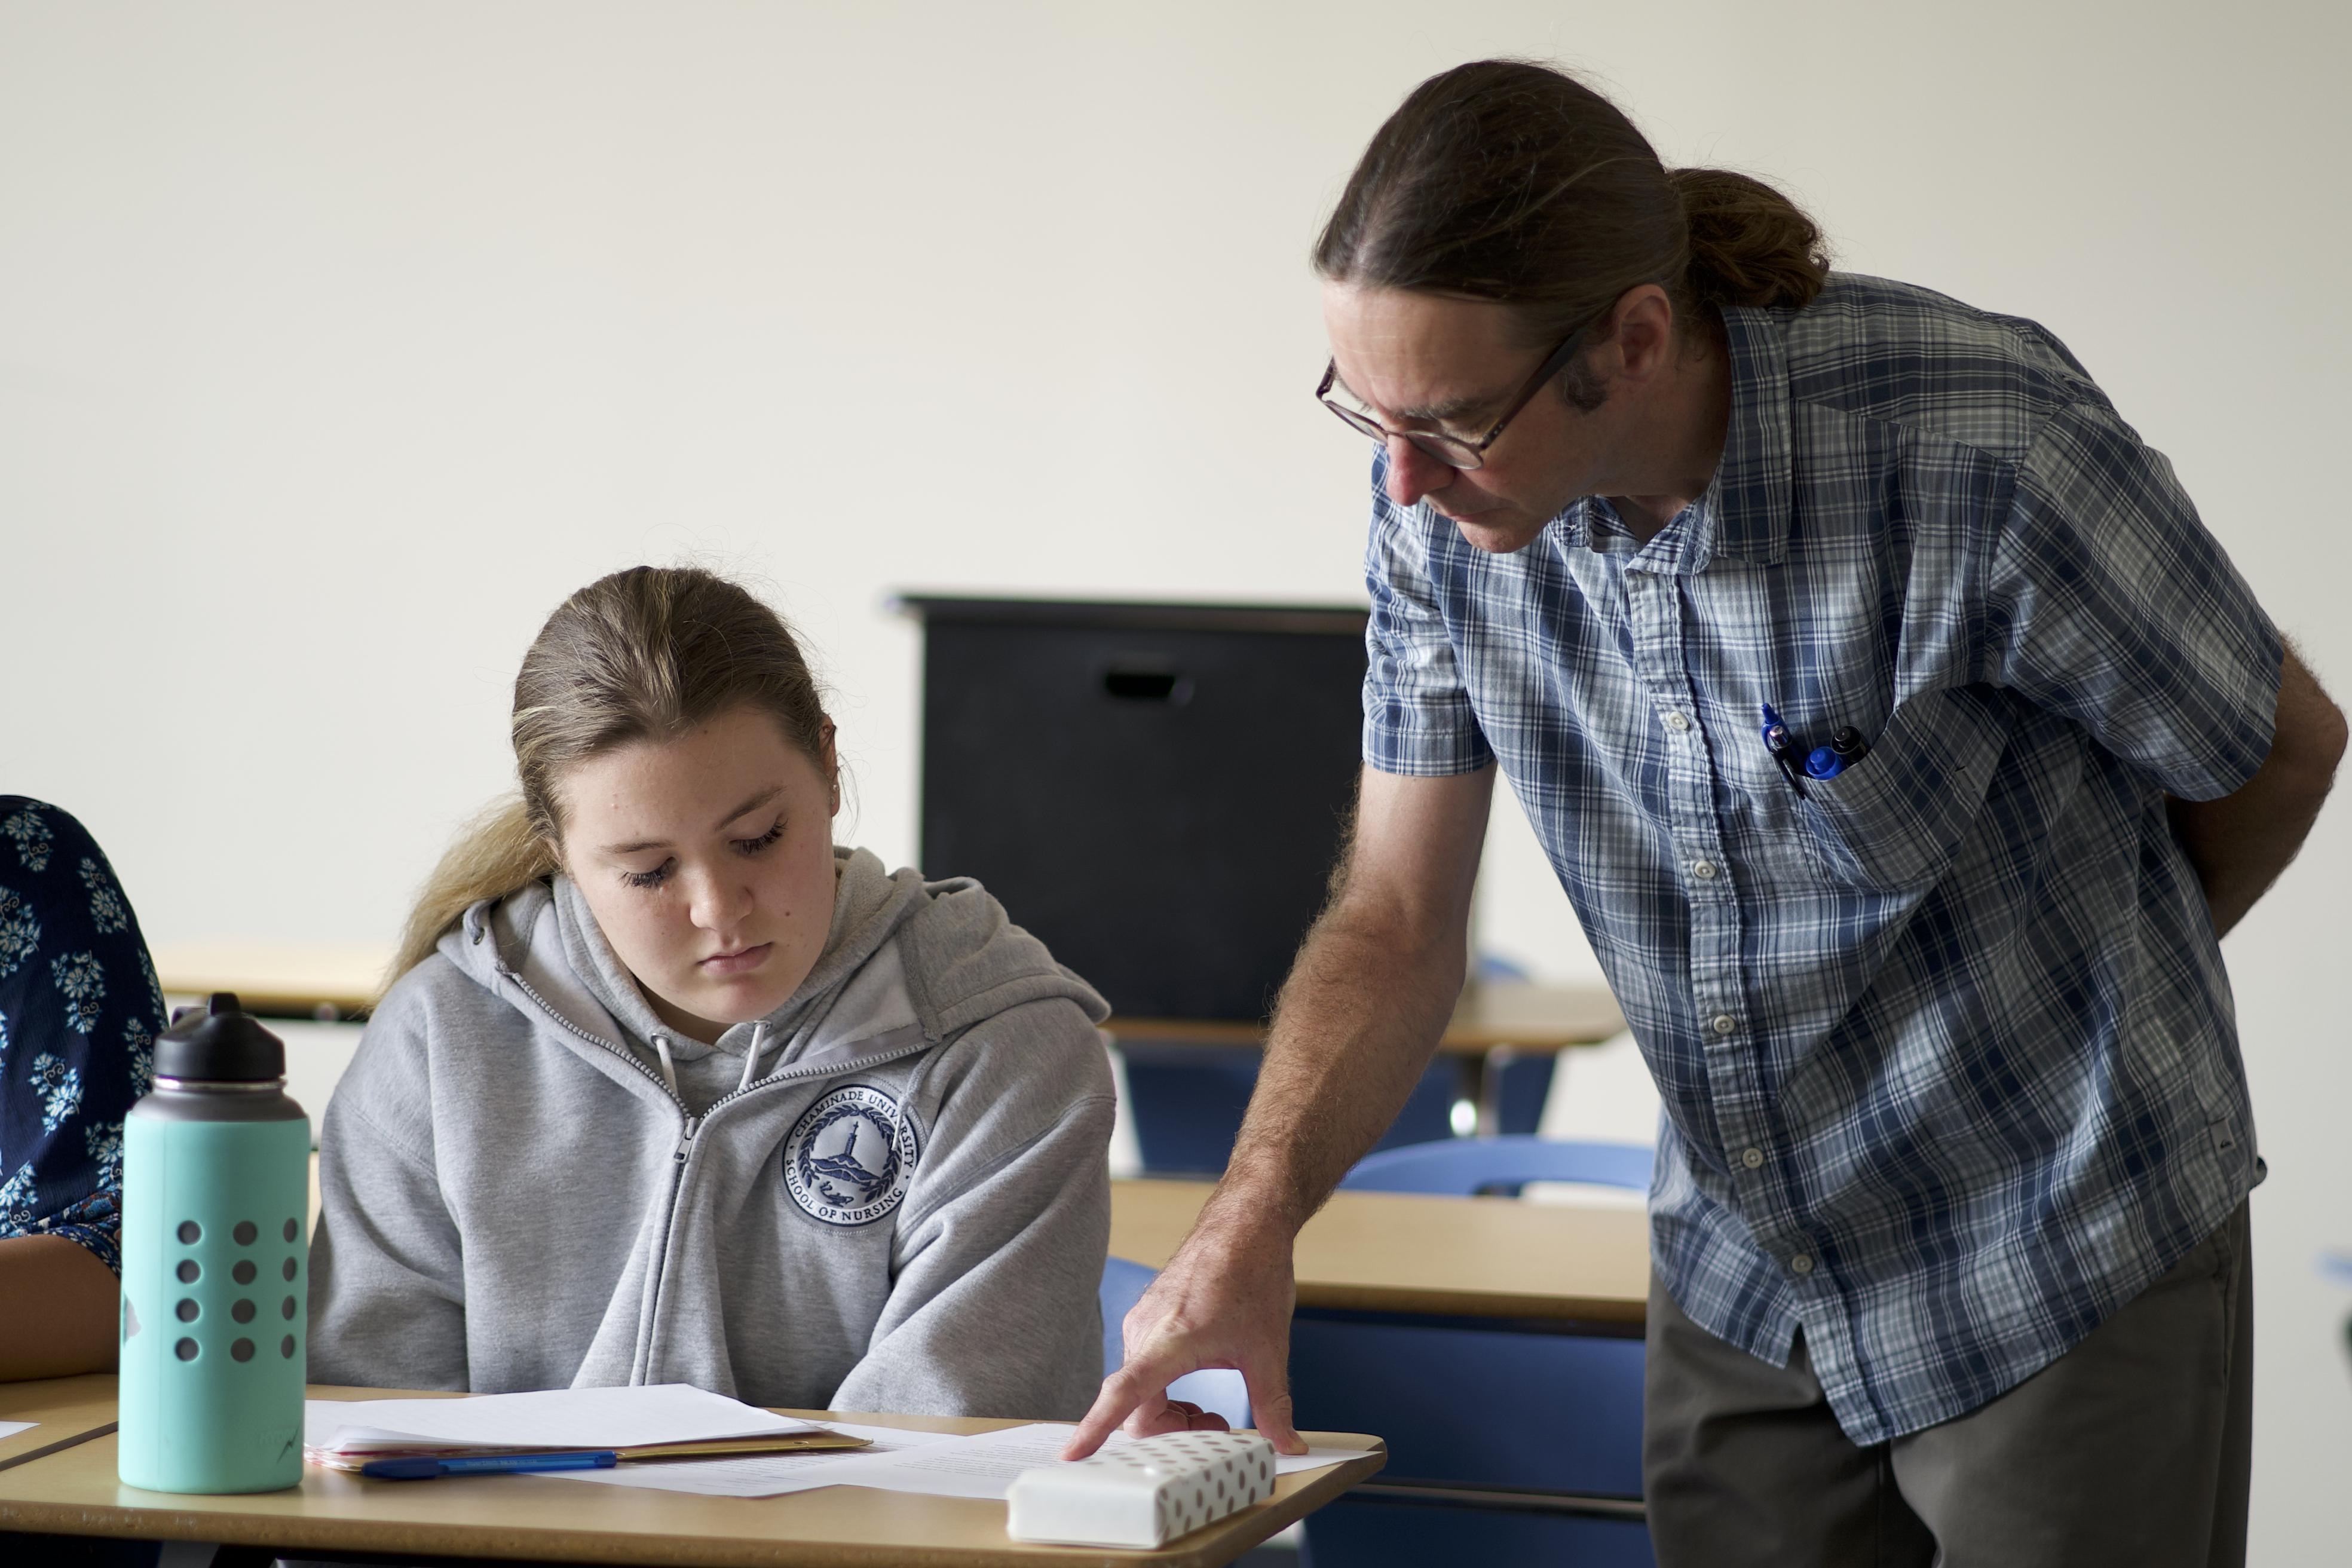 professor teaching a student